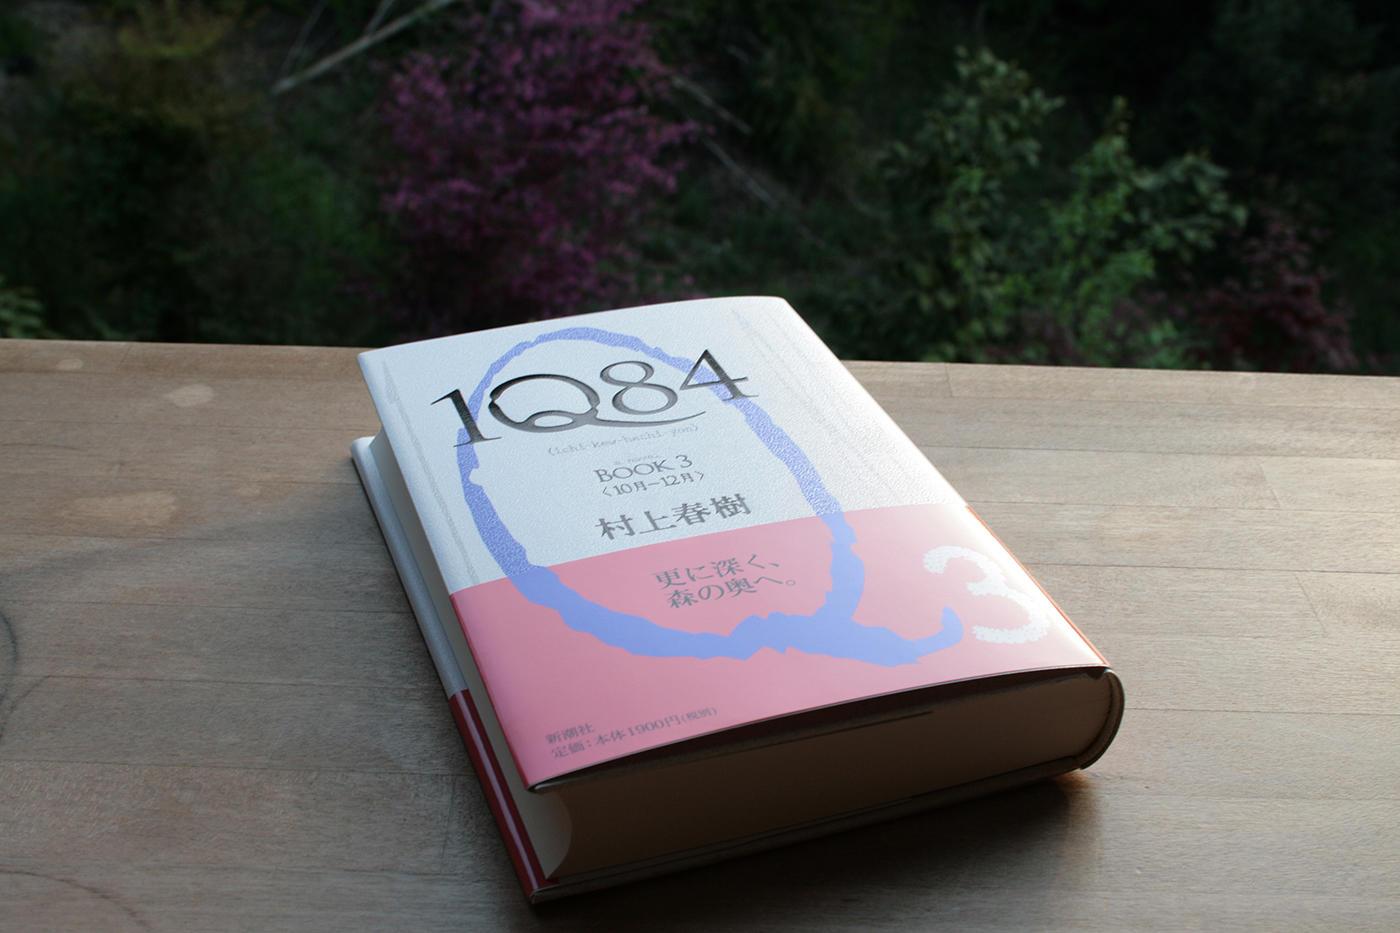 """1Q84"" Book3."